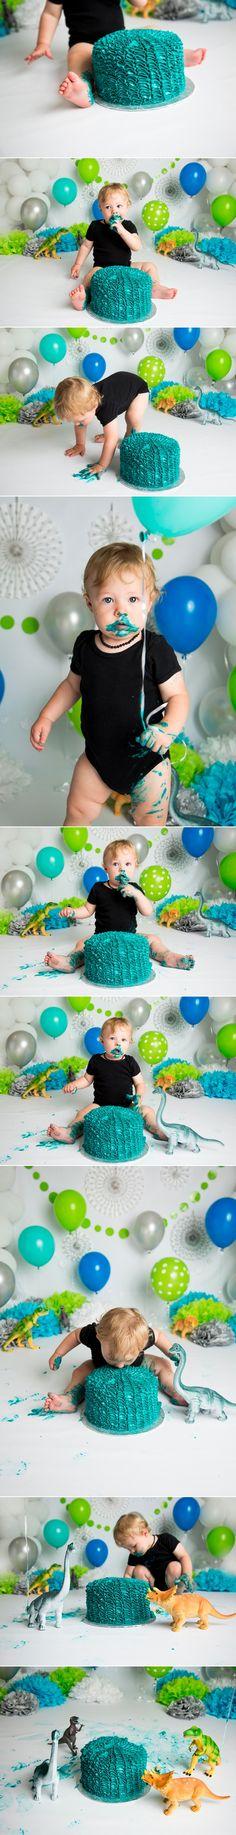 Green & Blue Dino Cake Smash | Holly Schaeffer Photography | Newborn & Cake Smash Photographer